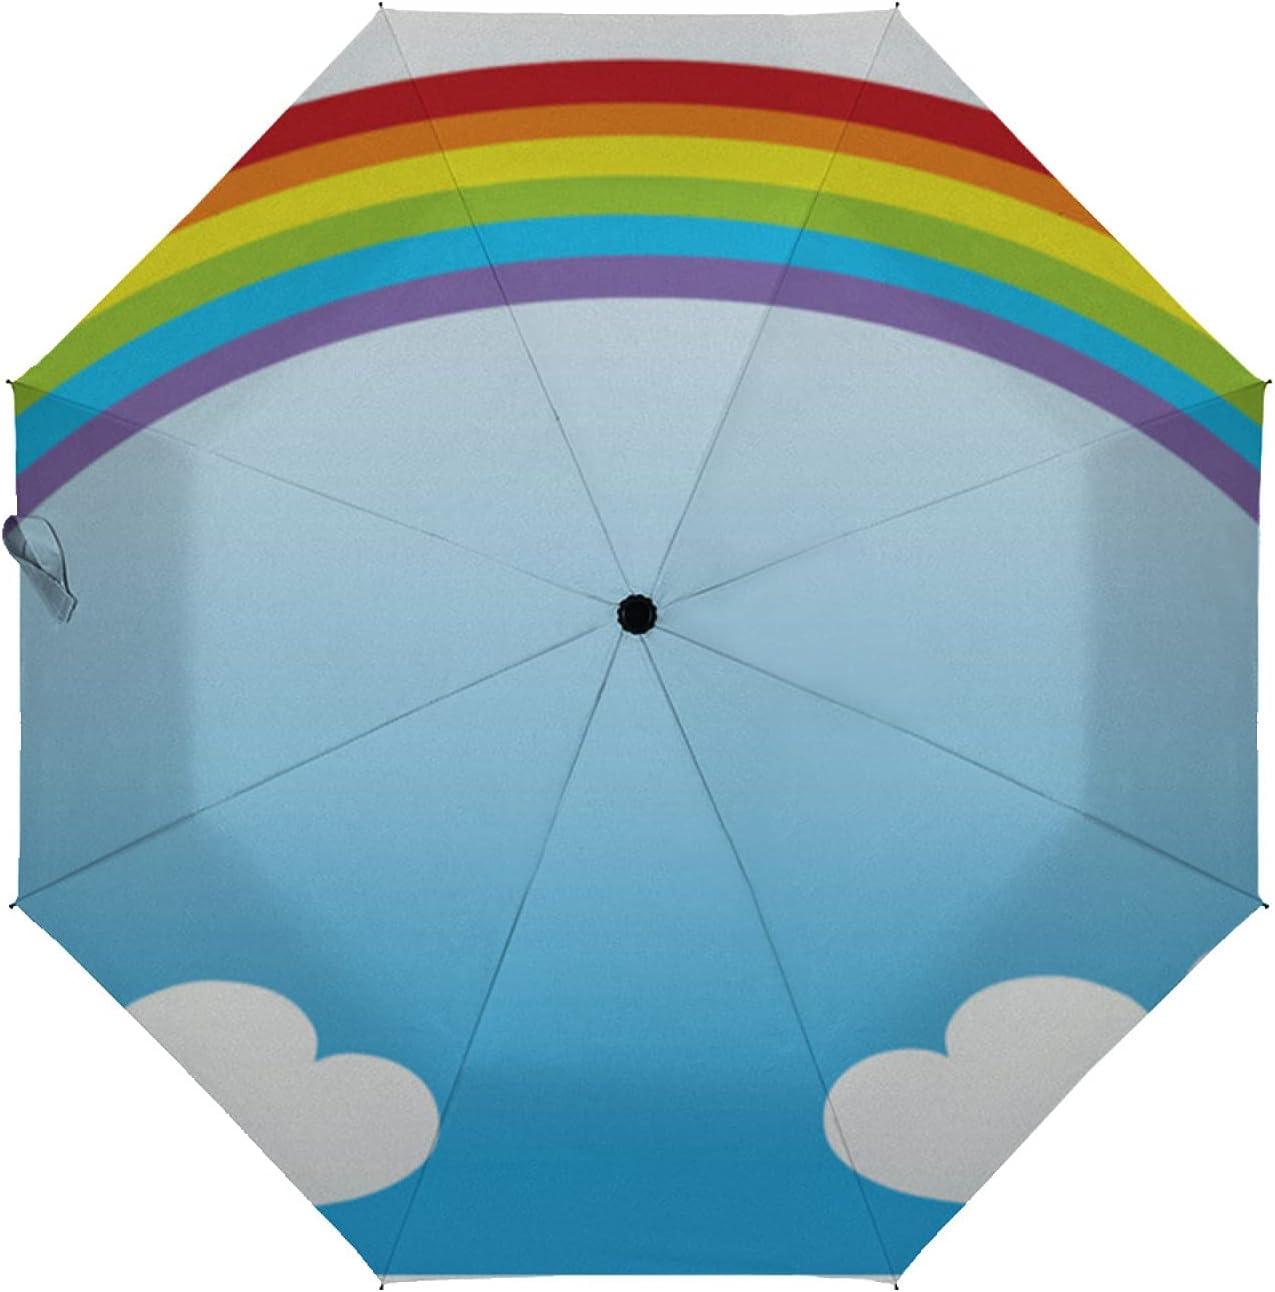 ZXZNC Austin Mall Auto Genuine Free Shipping Open Close Umbrella Cartoon and Cloud Cute Rainbow in